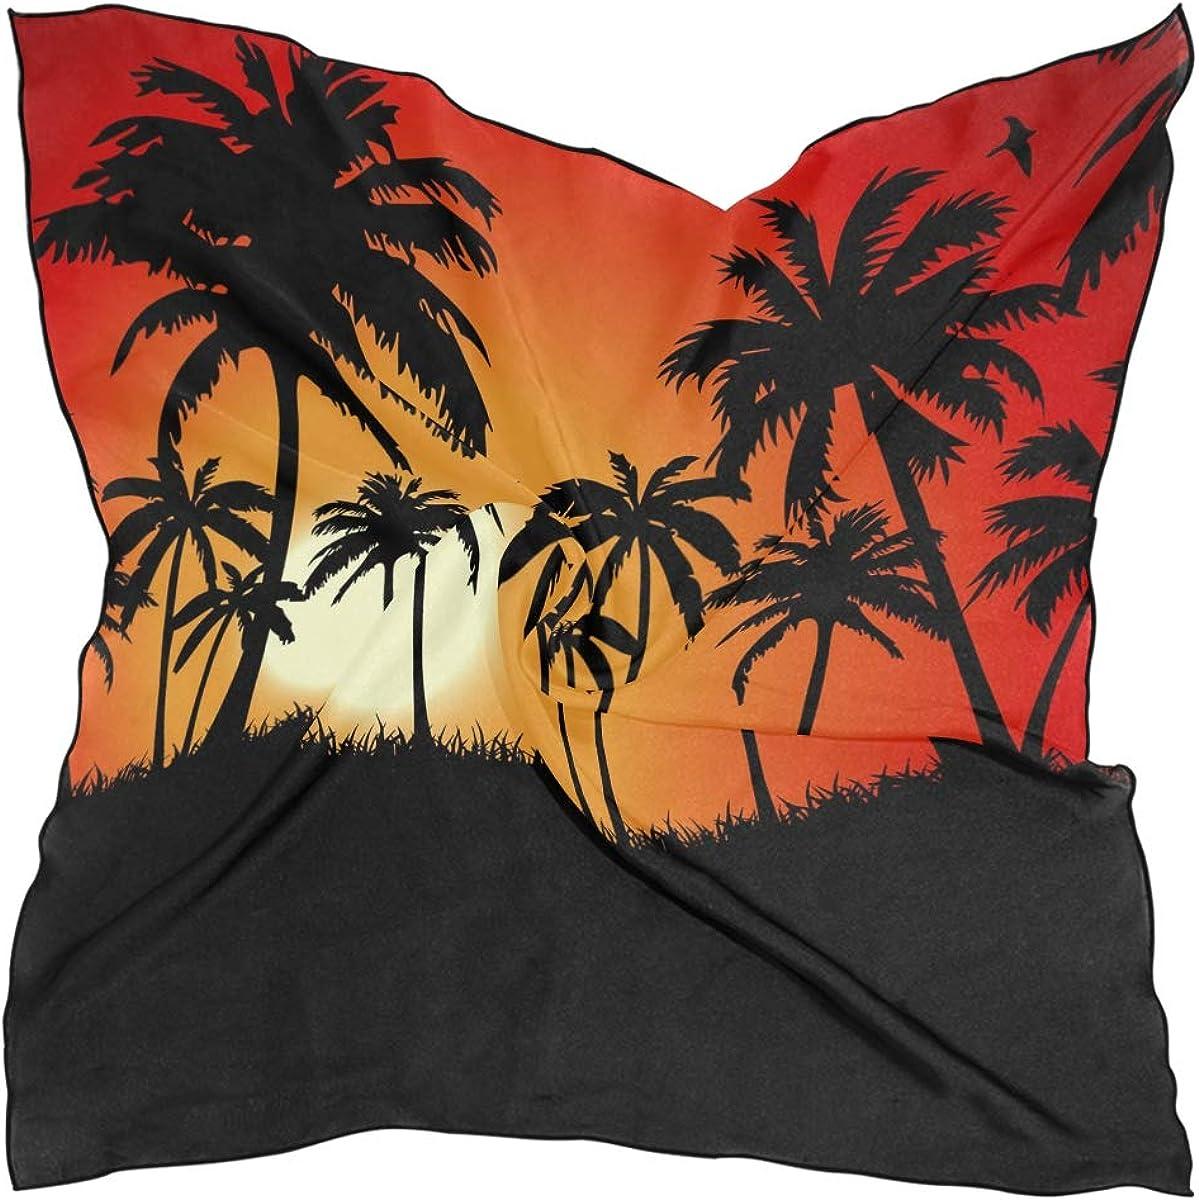 XLING Fashion Square Scarf Vintage Palm Tree Sunset Lightweight Sunscreen Scarves Muffler Hair Wrap Headscarf Neckerchief for Women Men